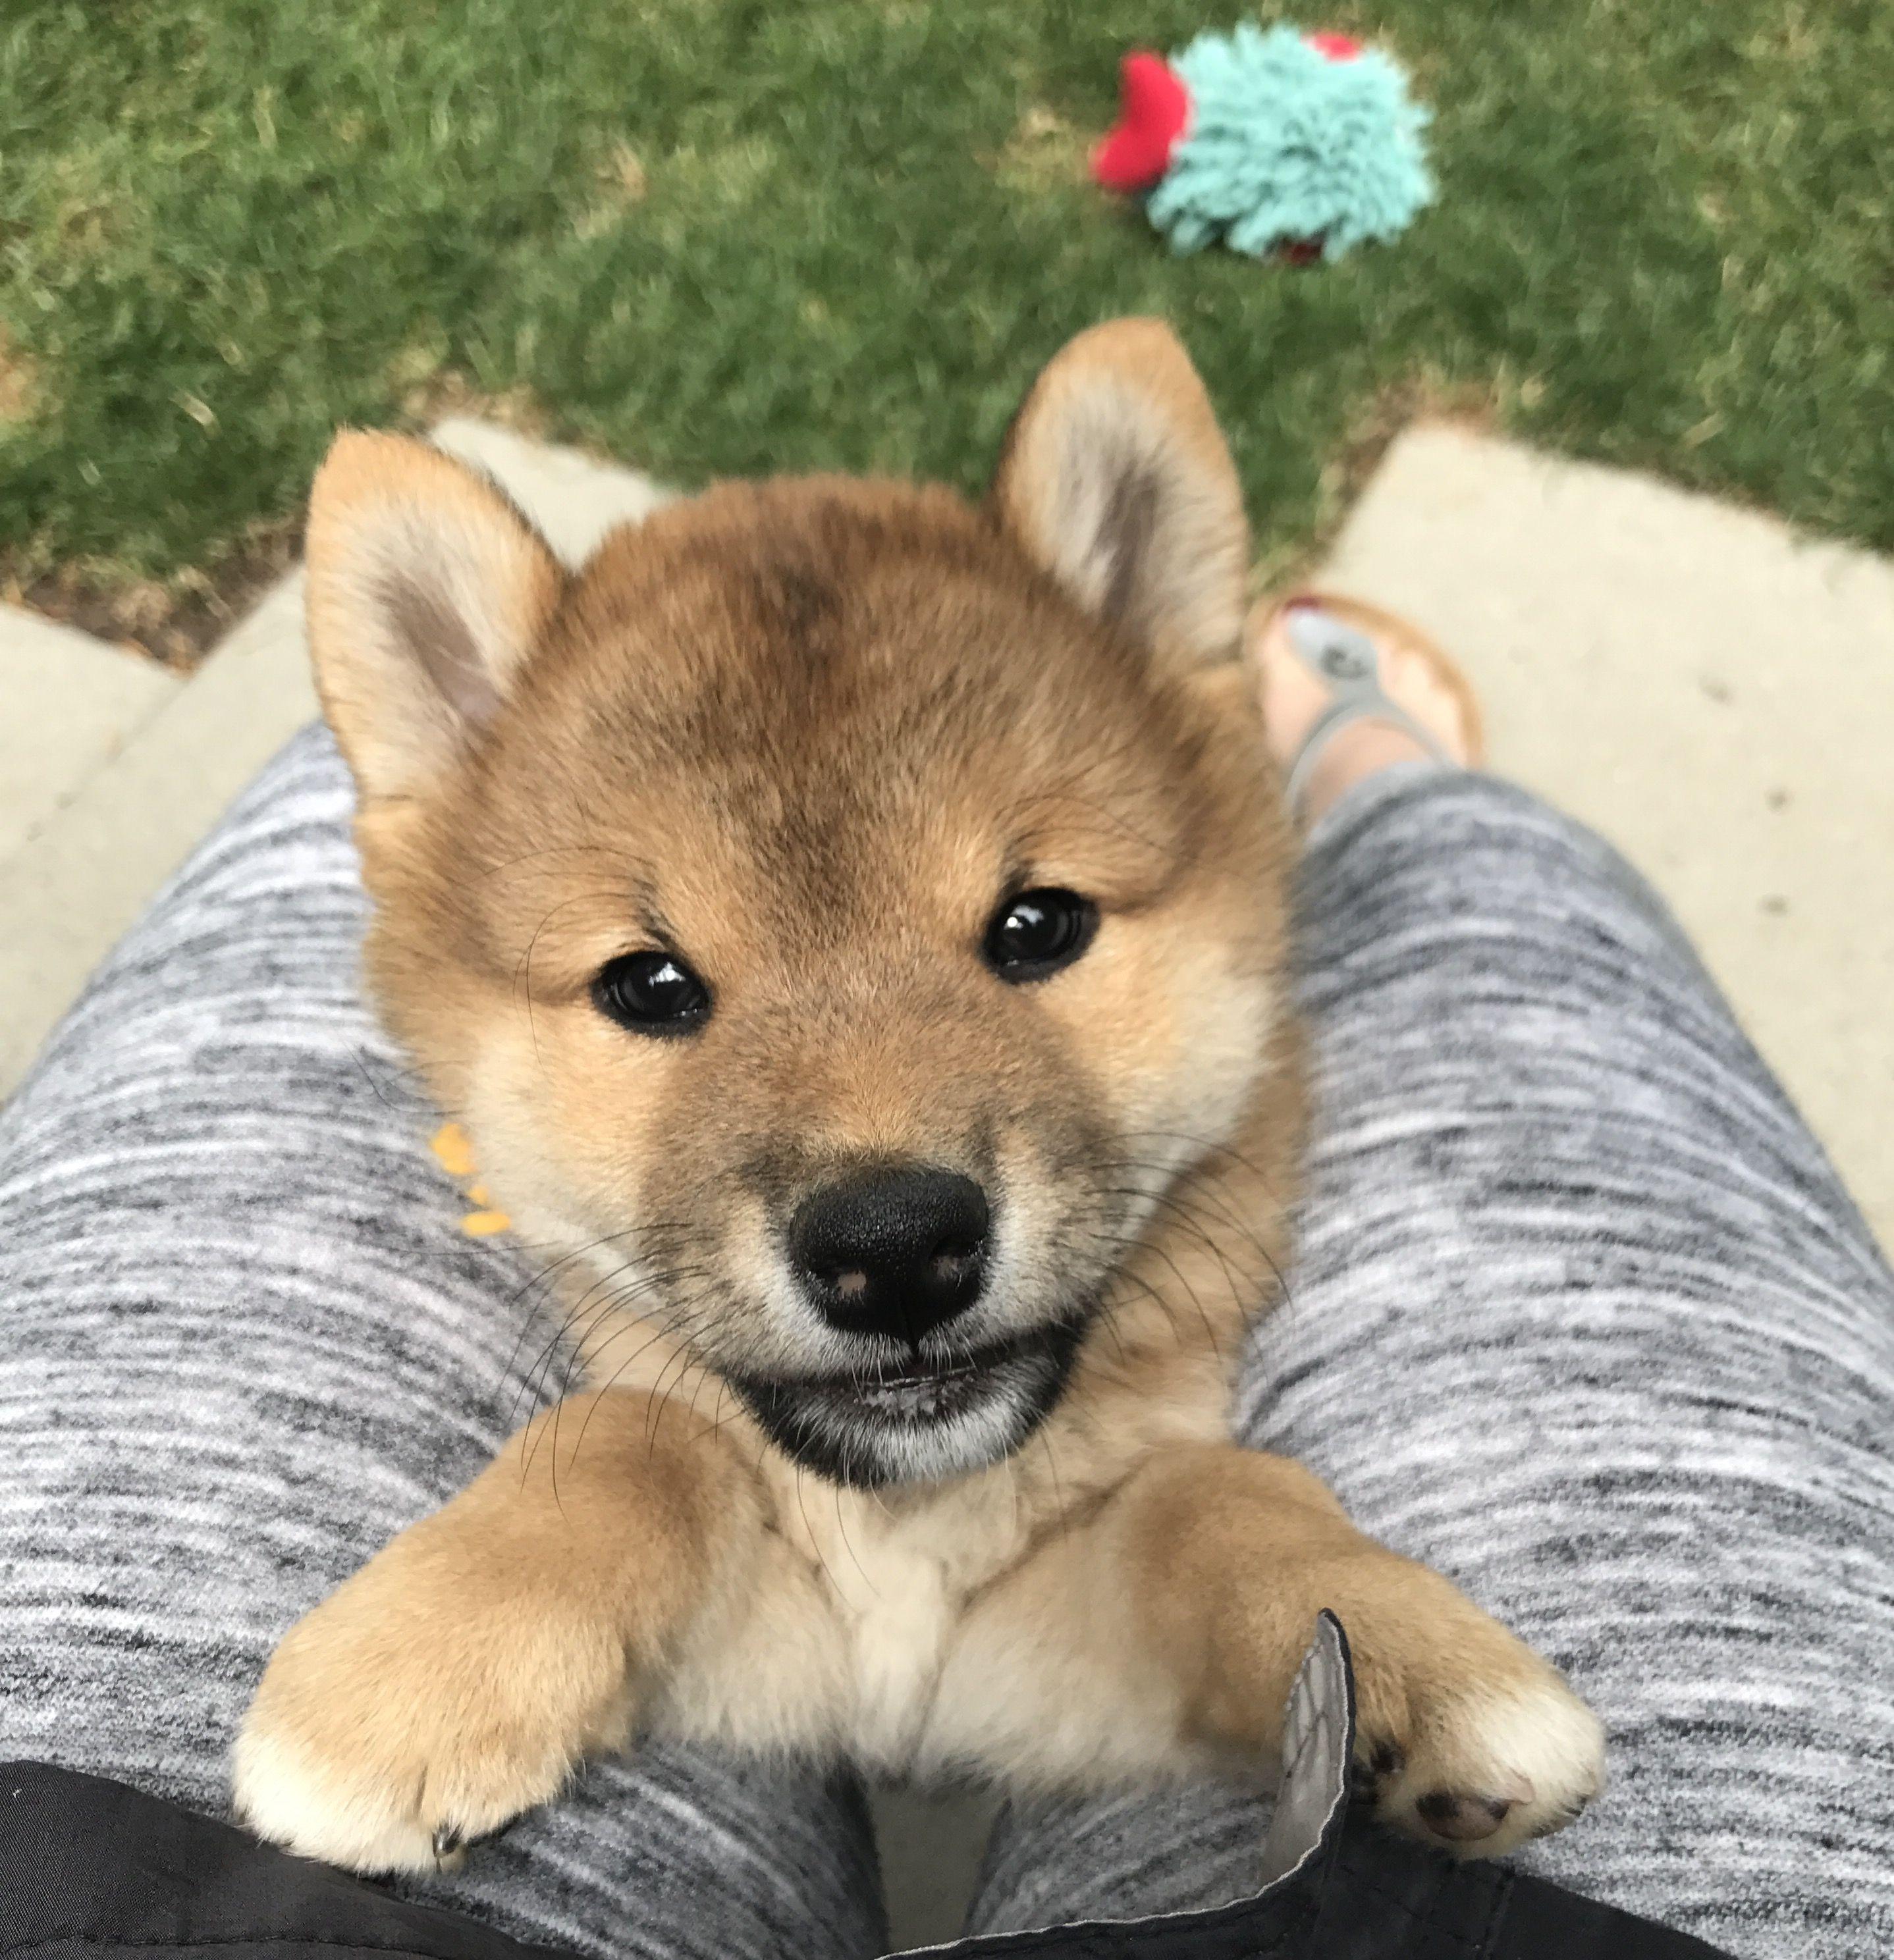 7 Week Old Shiba Inu Puppy His Name Is Ren Shiba Inu Shiba Inu Puppy Puppies